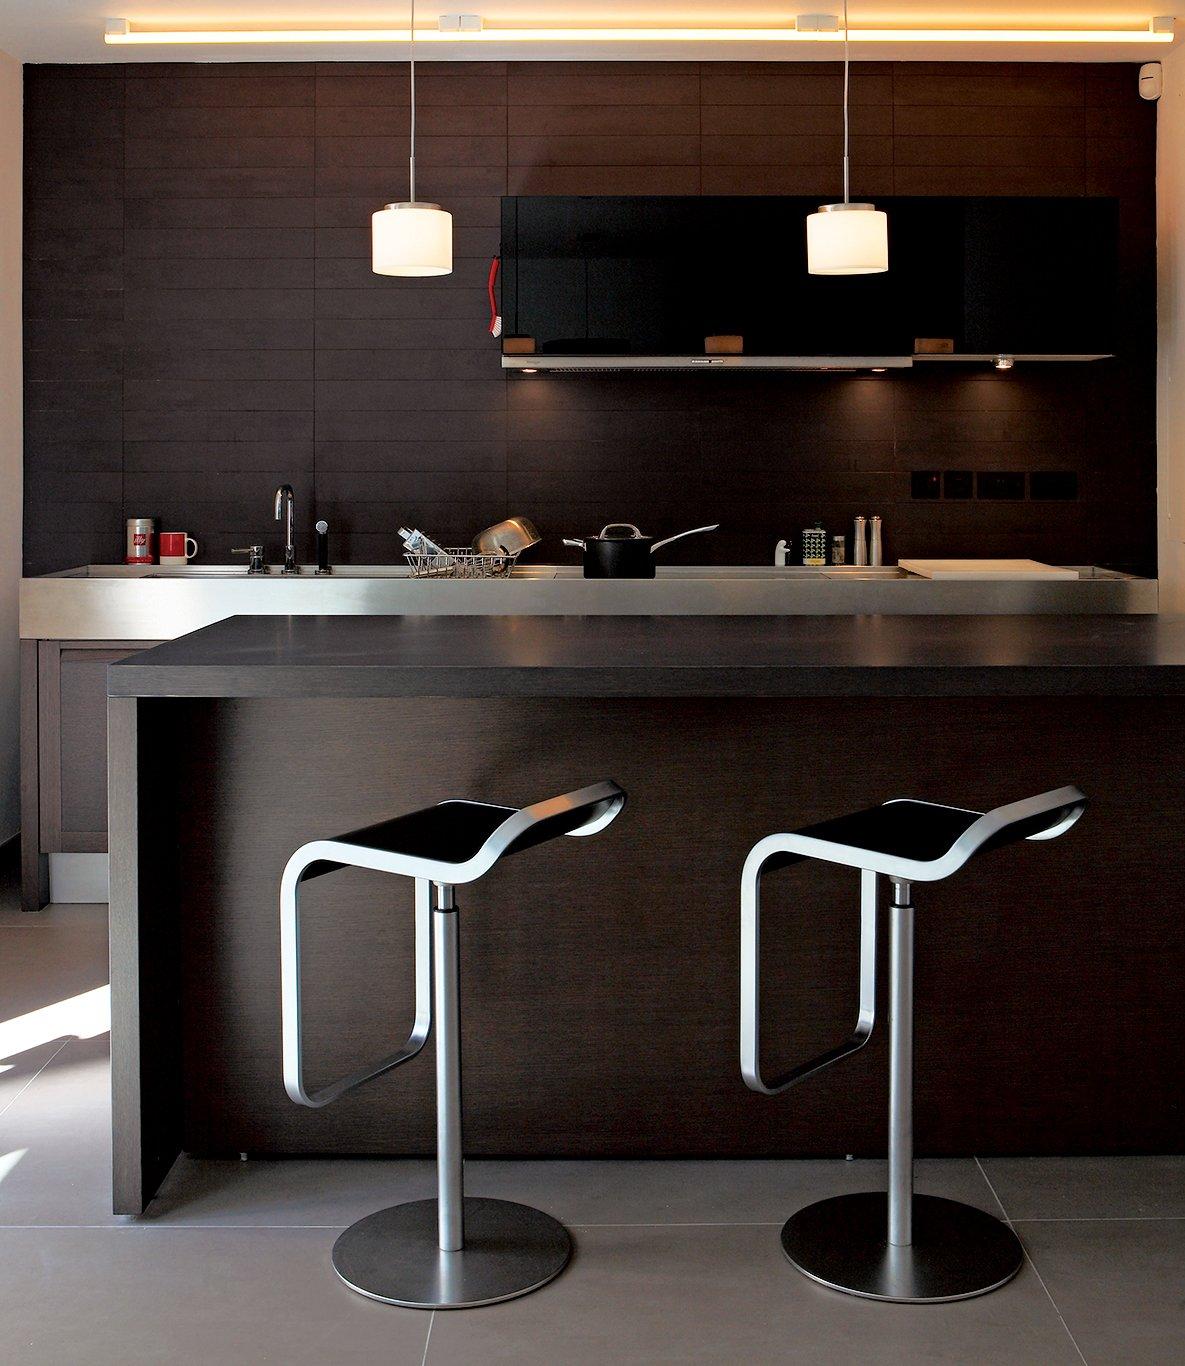 #seatingdesign #interior #inside #indoor #custom #clad #TheSunkenHouse #photographer #EdReeve #DavidAdjaye #london #DeBeauvoir #cedar #modern #stool #kitchen  100+ Best Modern Seating Designs